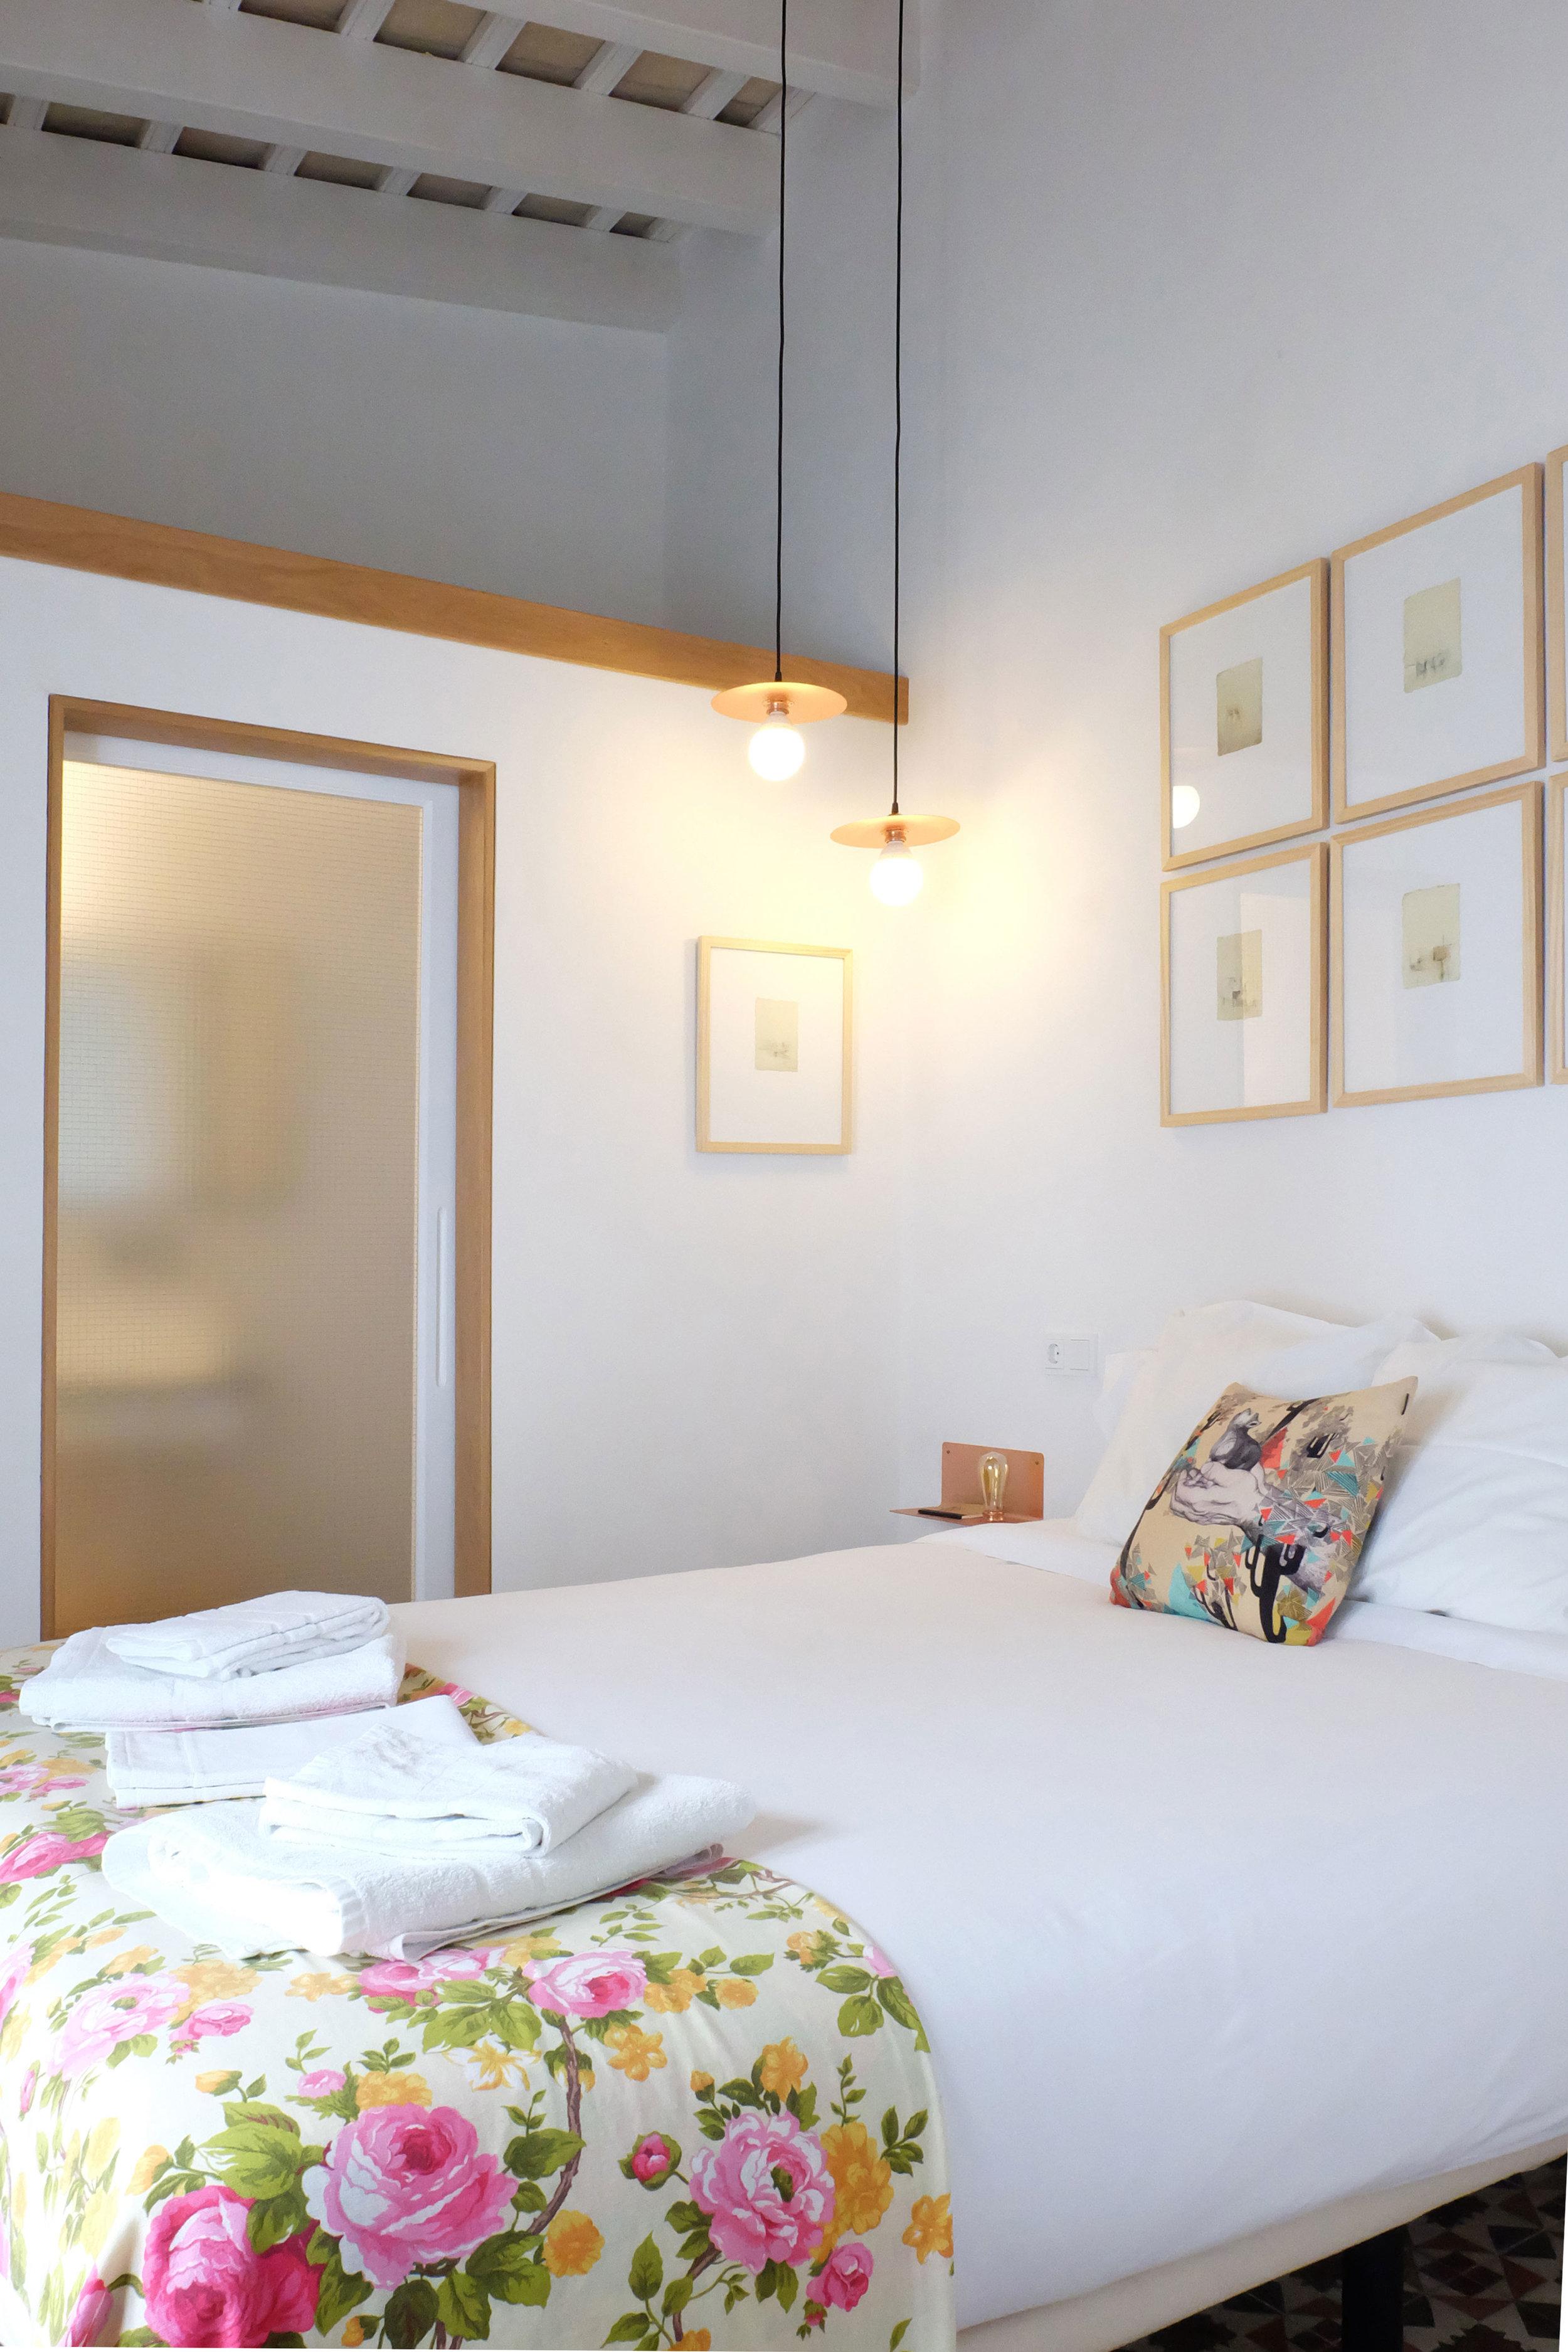 Hotel-Casa-de-Huespedes-Santa-Maria-Habitacion-10-3.jpg